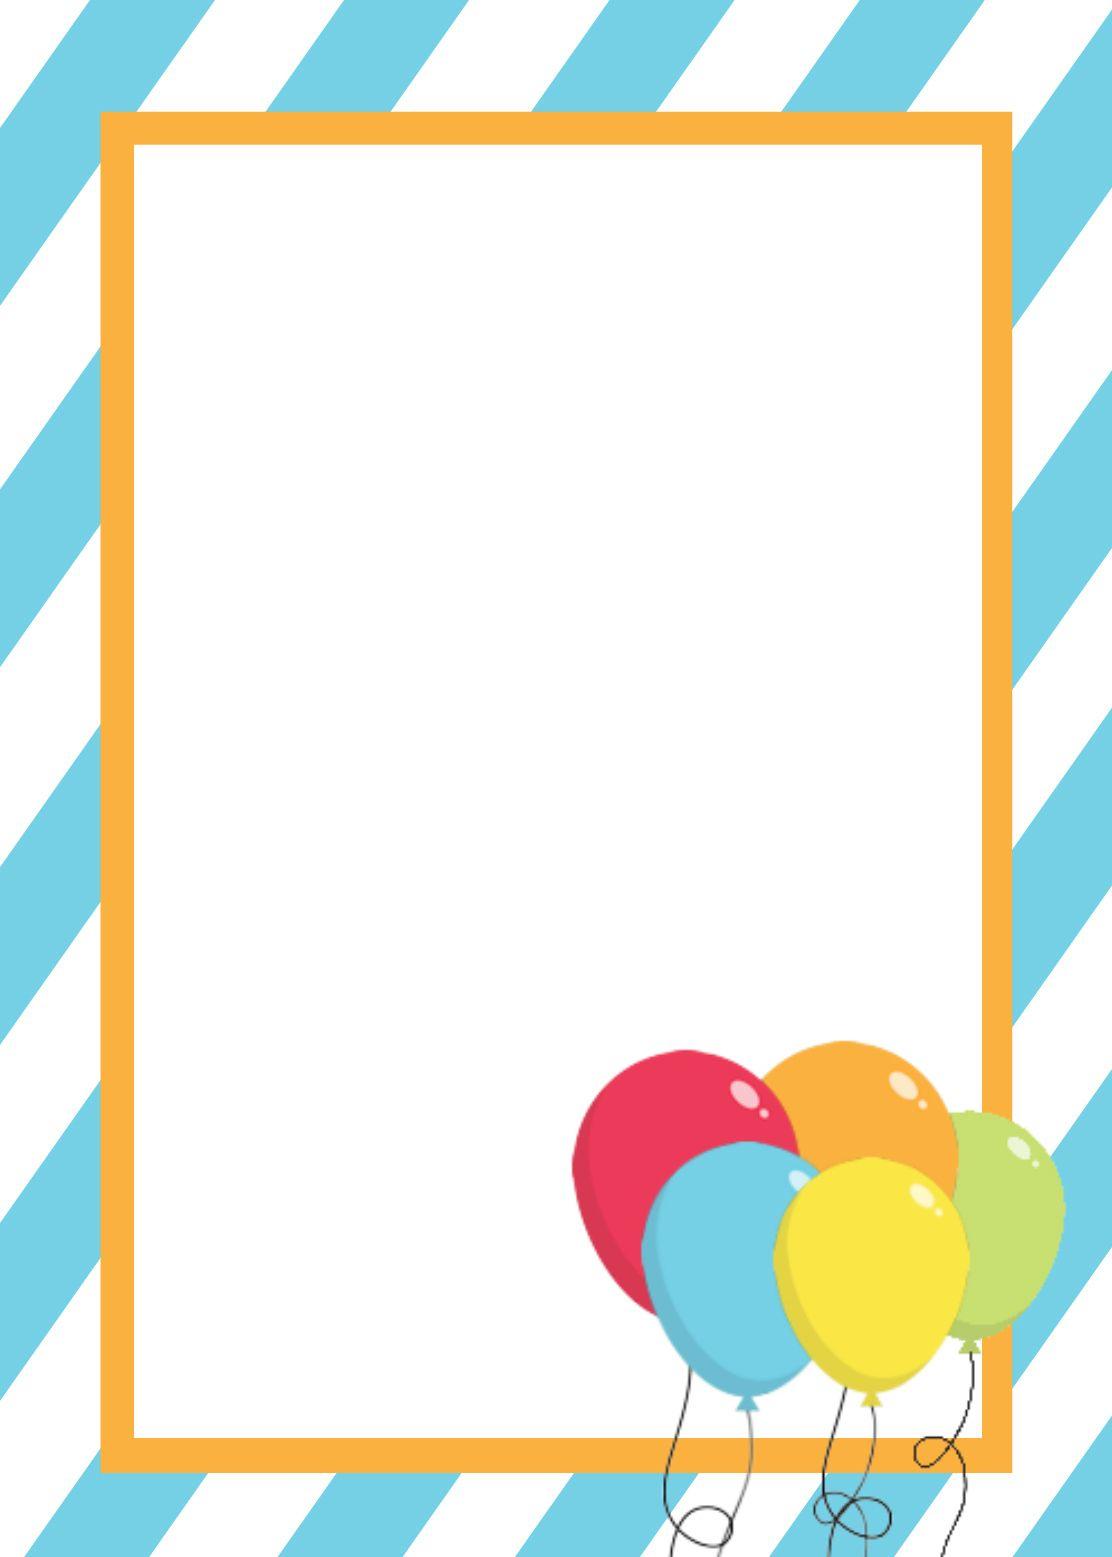 Free Printable Birthday Invitation Templates   Birthday Ideas And - Free Printable Birthday Invitation Cards